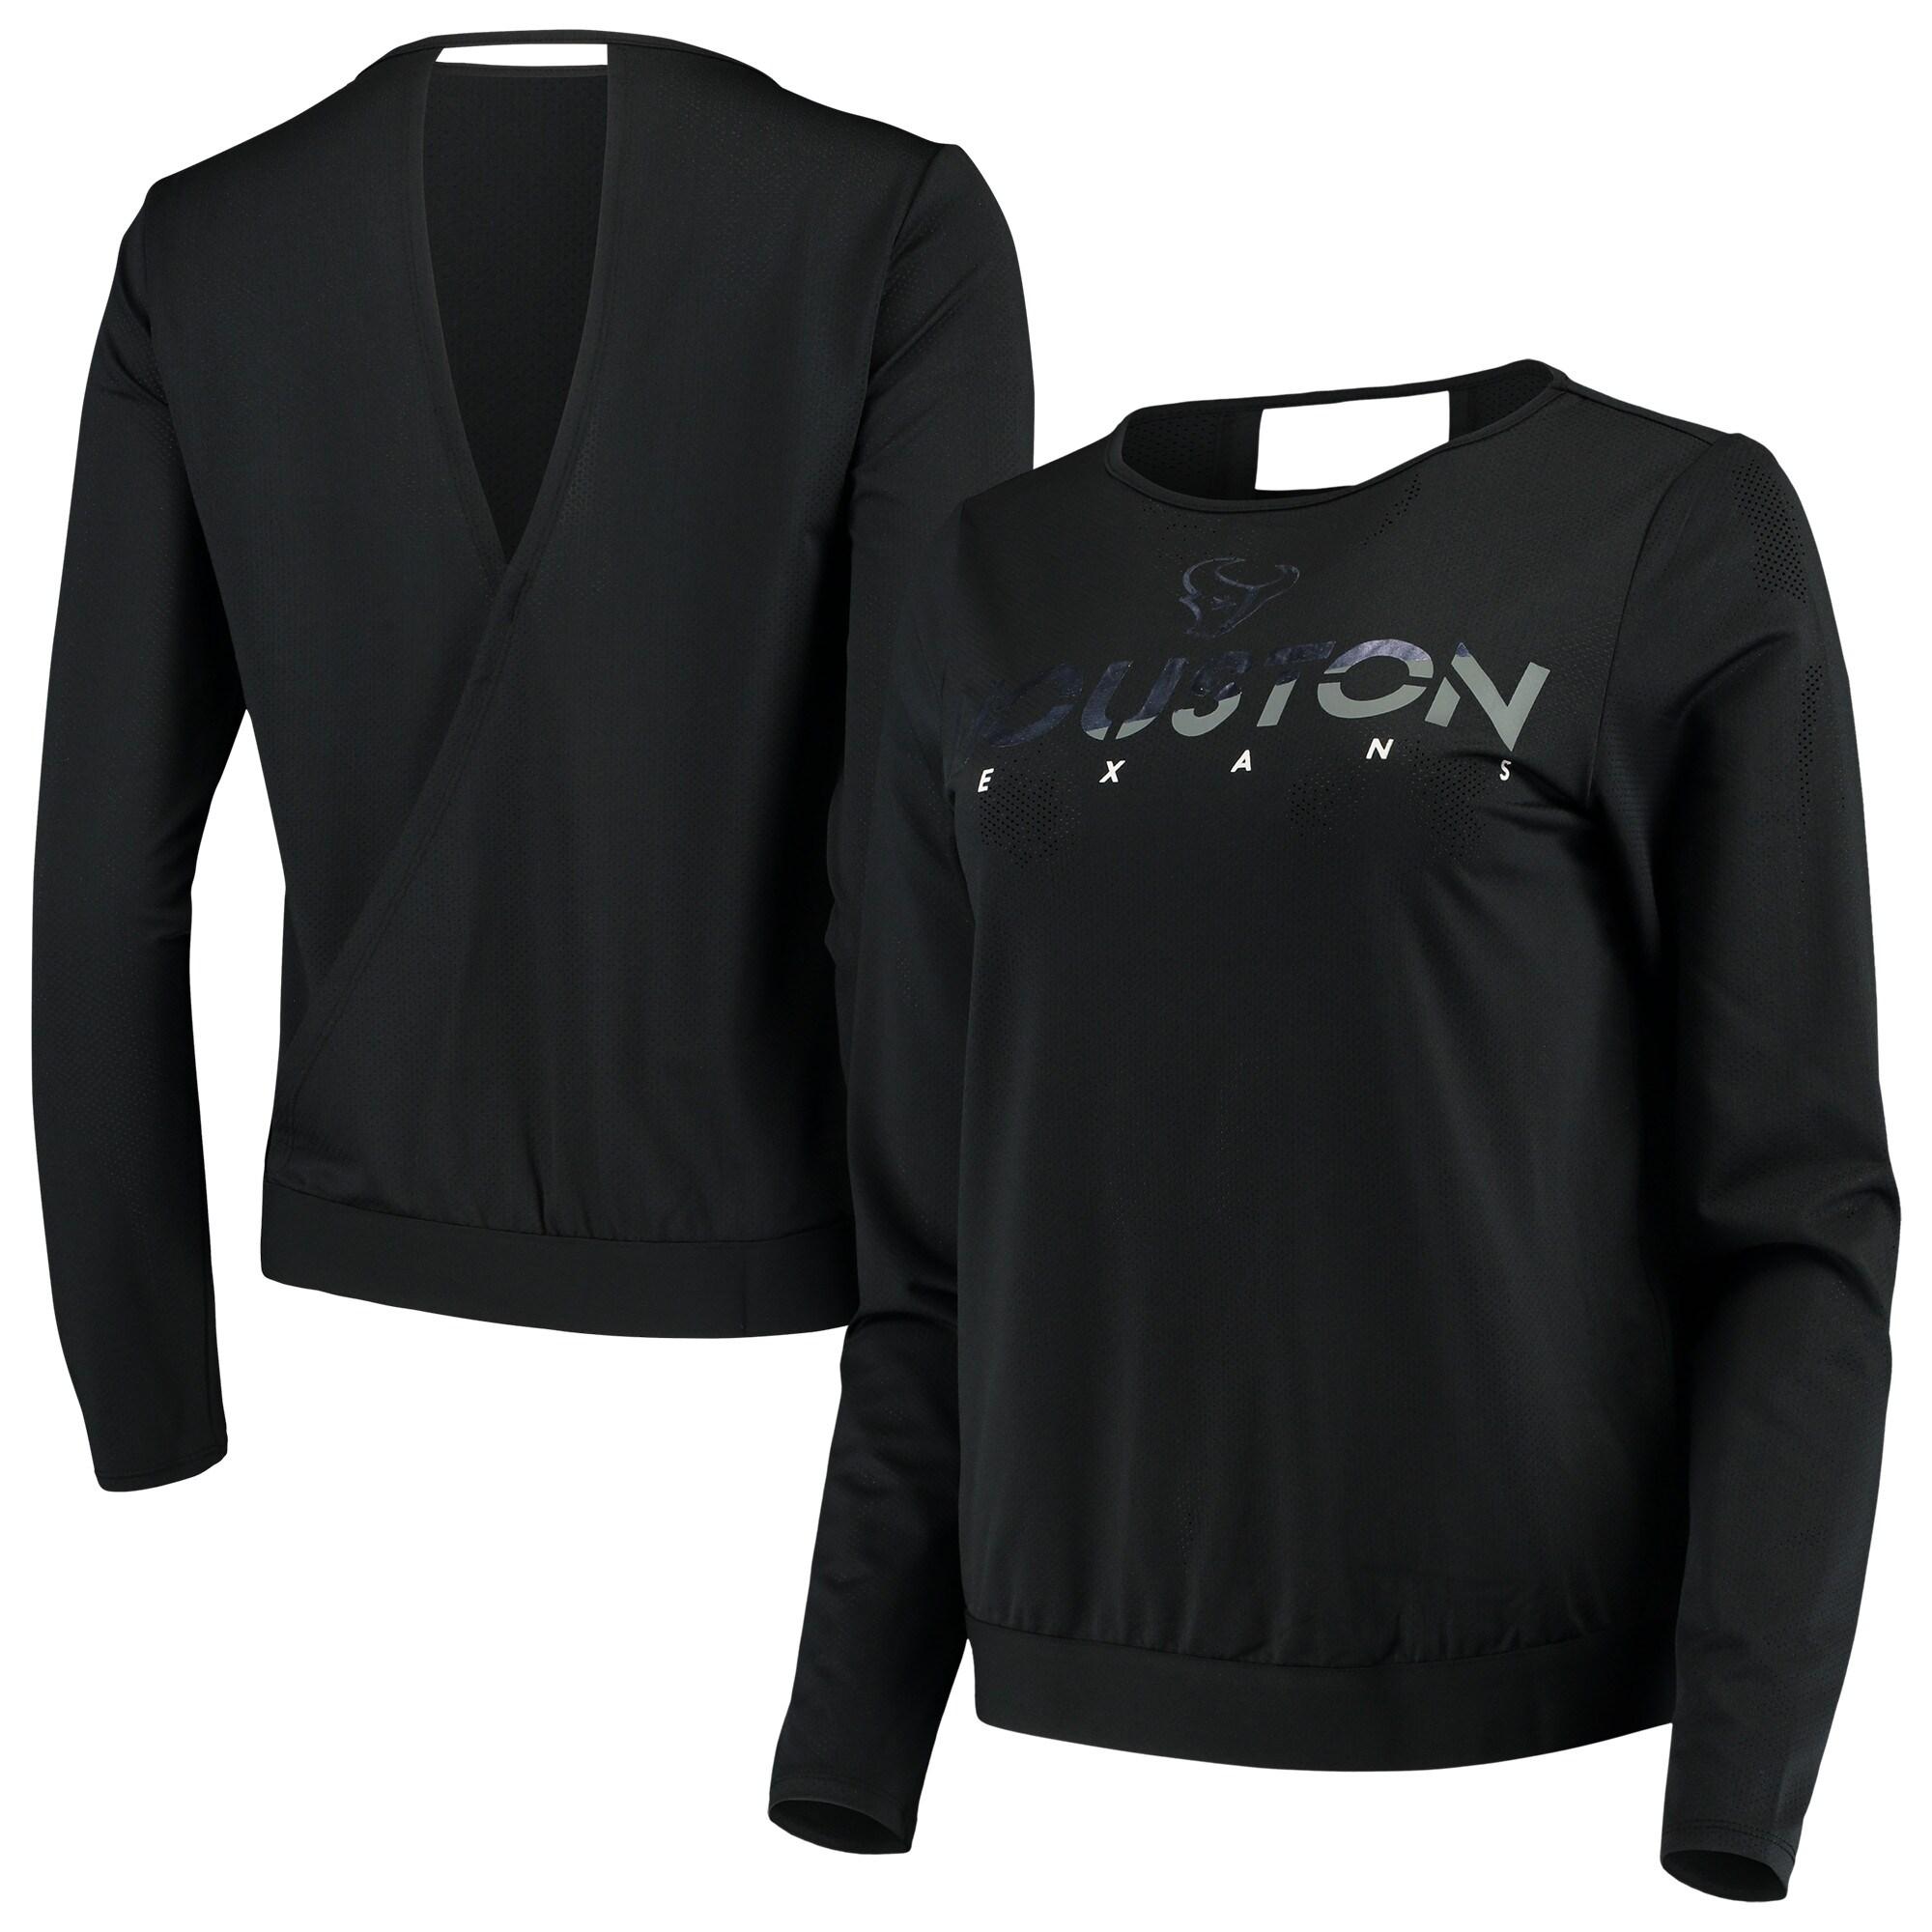 Houston Texans Touch by Alyssa Milano Women's Breeze Back Long Sleeve V-Neck T-Shirt - Black